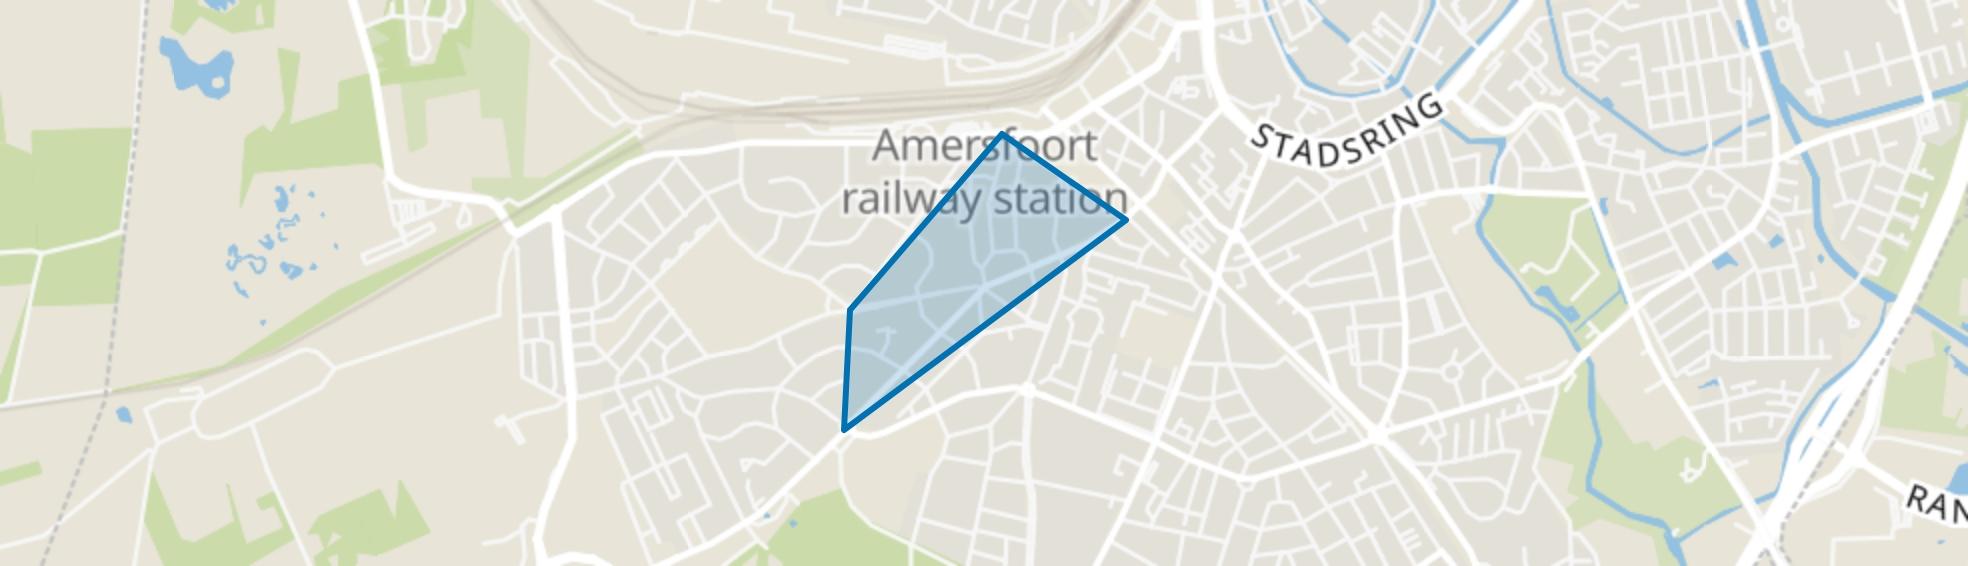 Regentesselaan, Amersfoort map